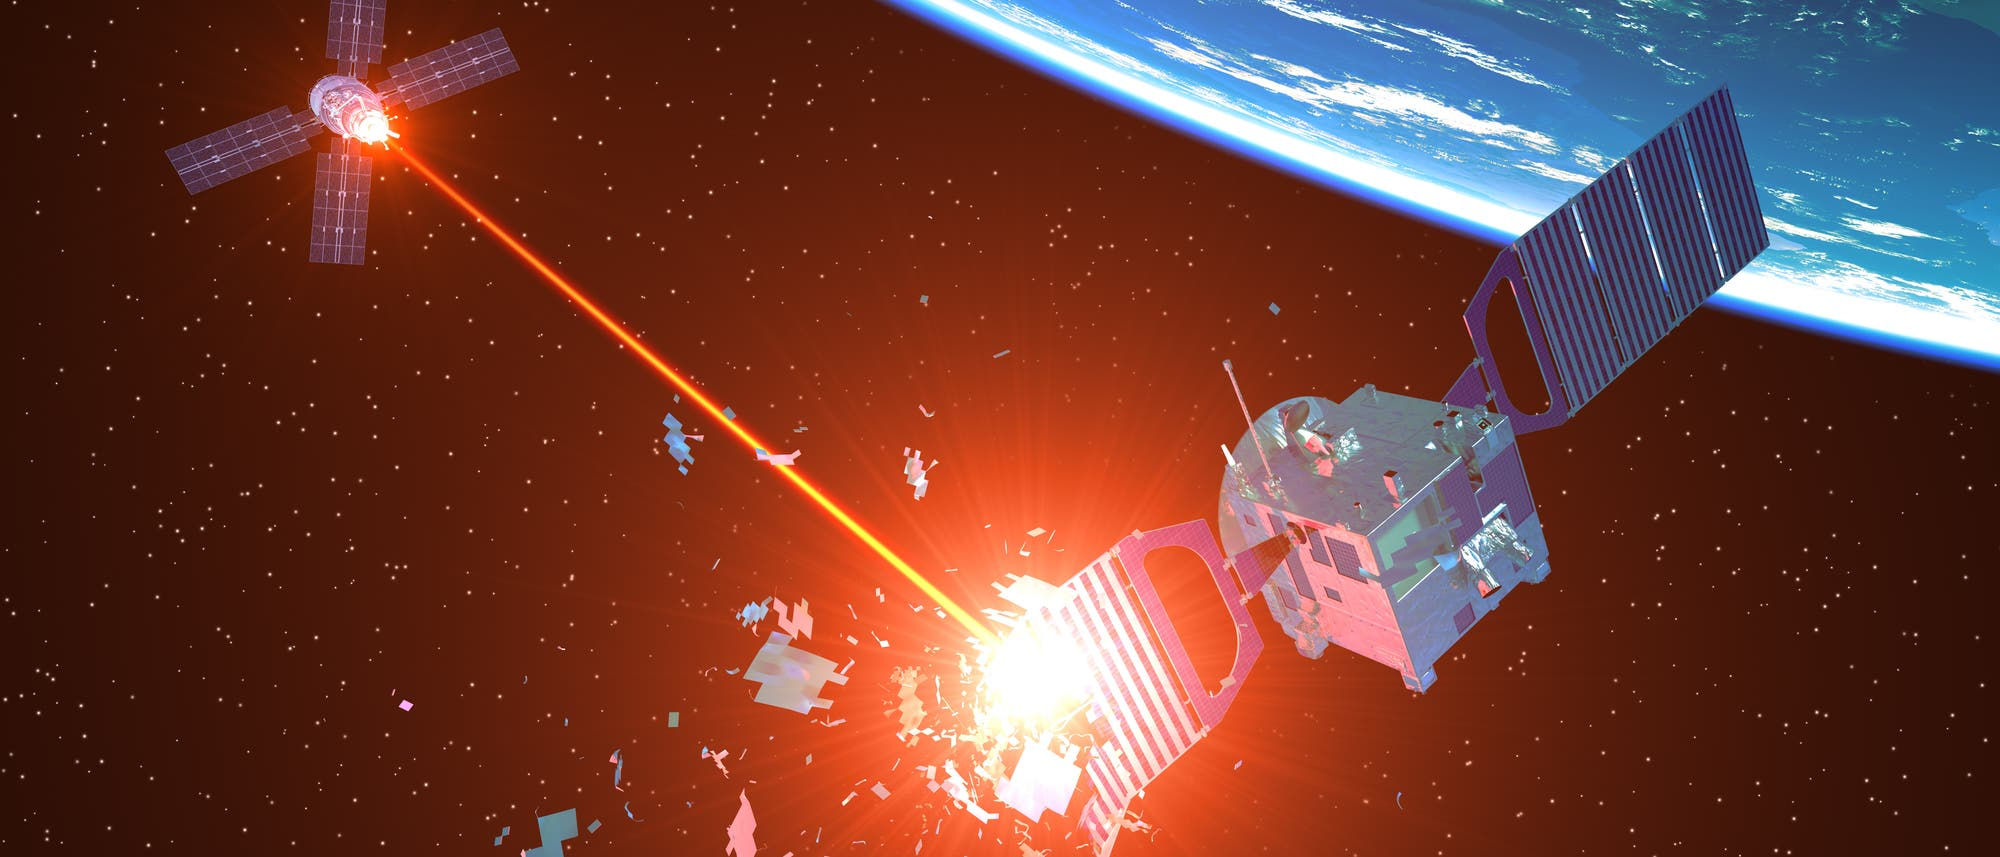 Raumflugkörper attackiert Satelliten mittels Laserstrahl.